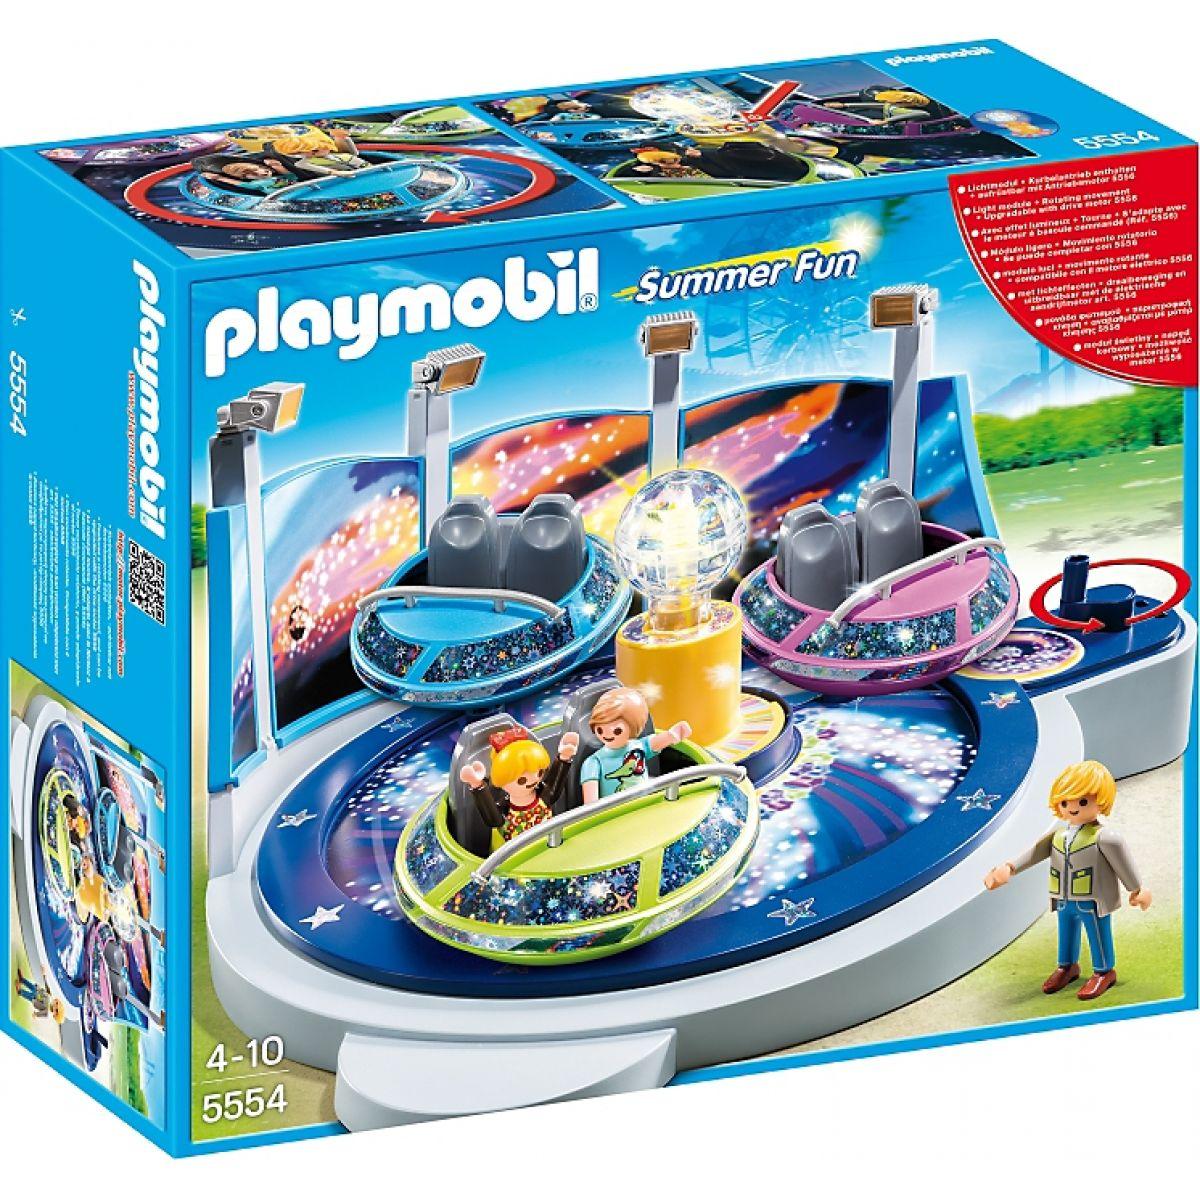 Playmobil 5554 Spacership